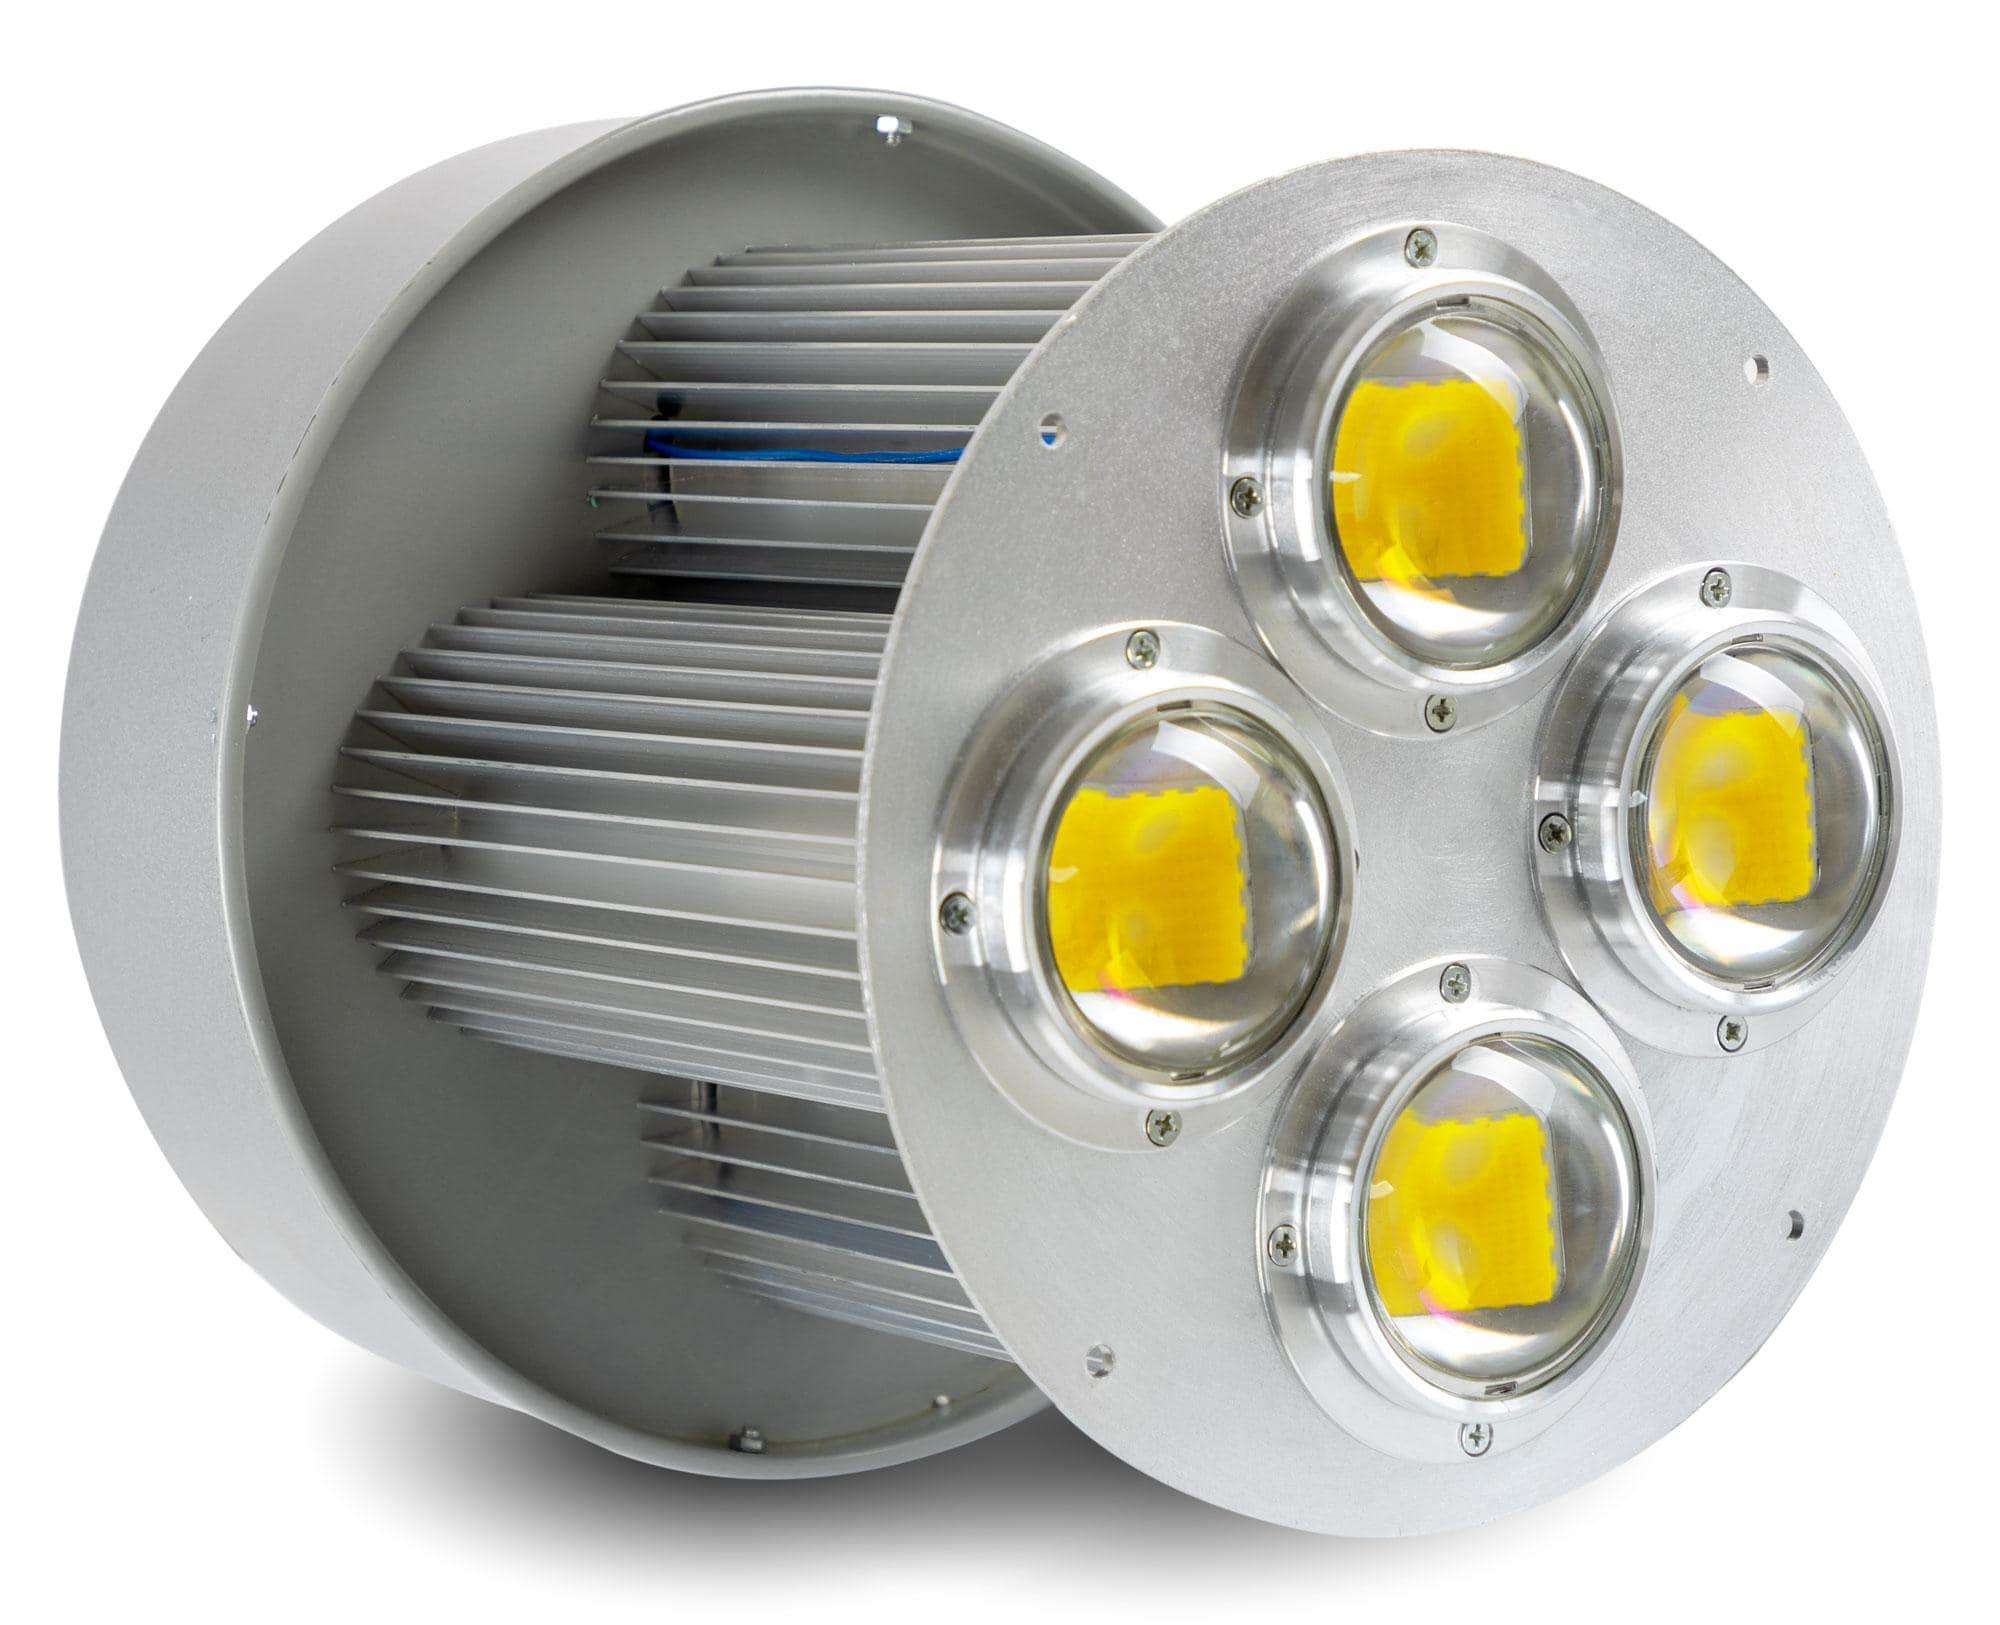 High Bay Lampen : Led high bay hallenstrahler cob highbay industrie lampe decken